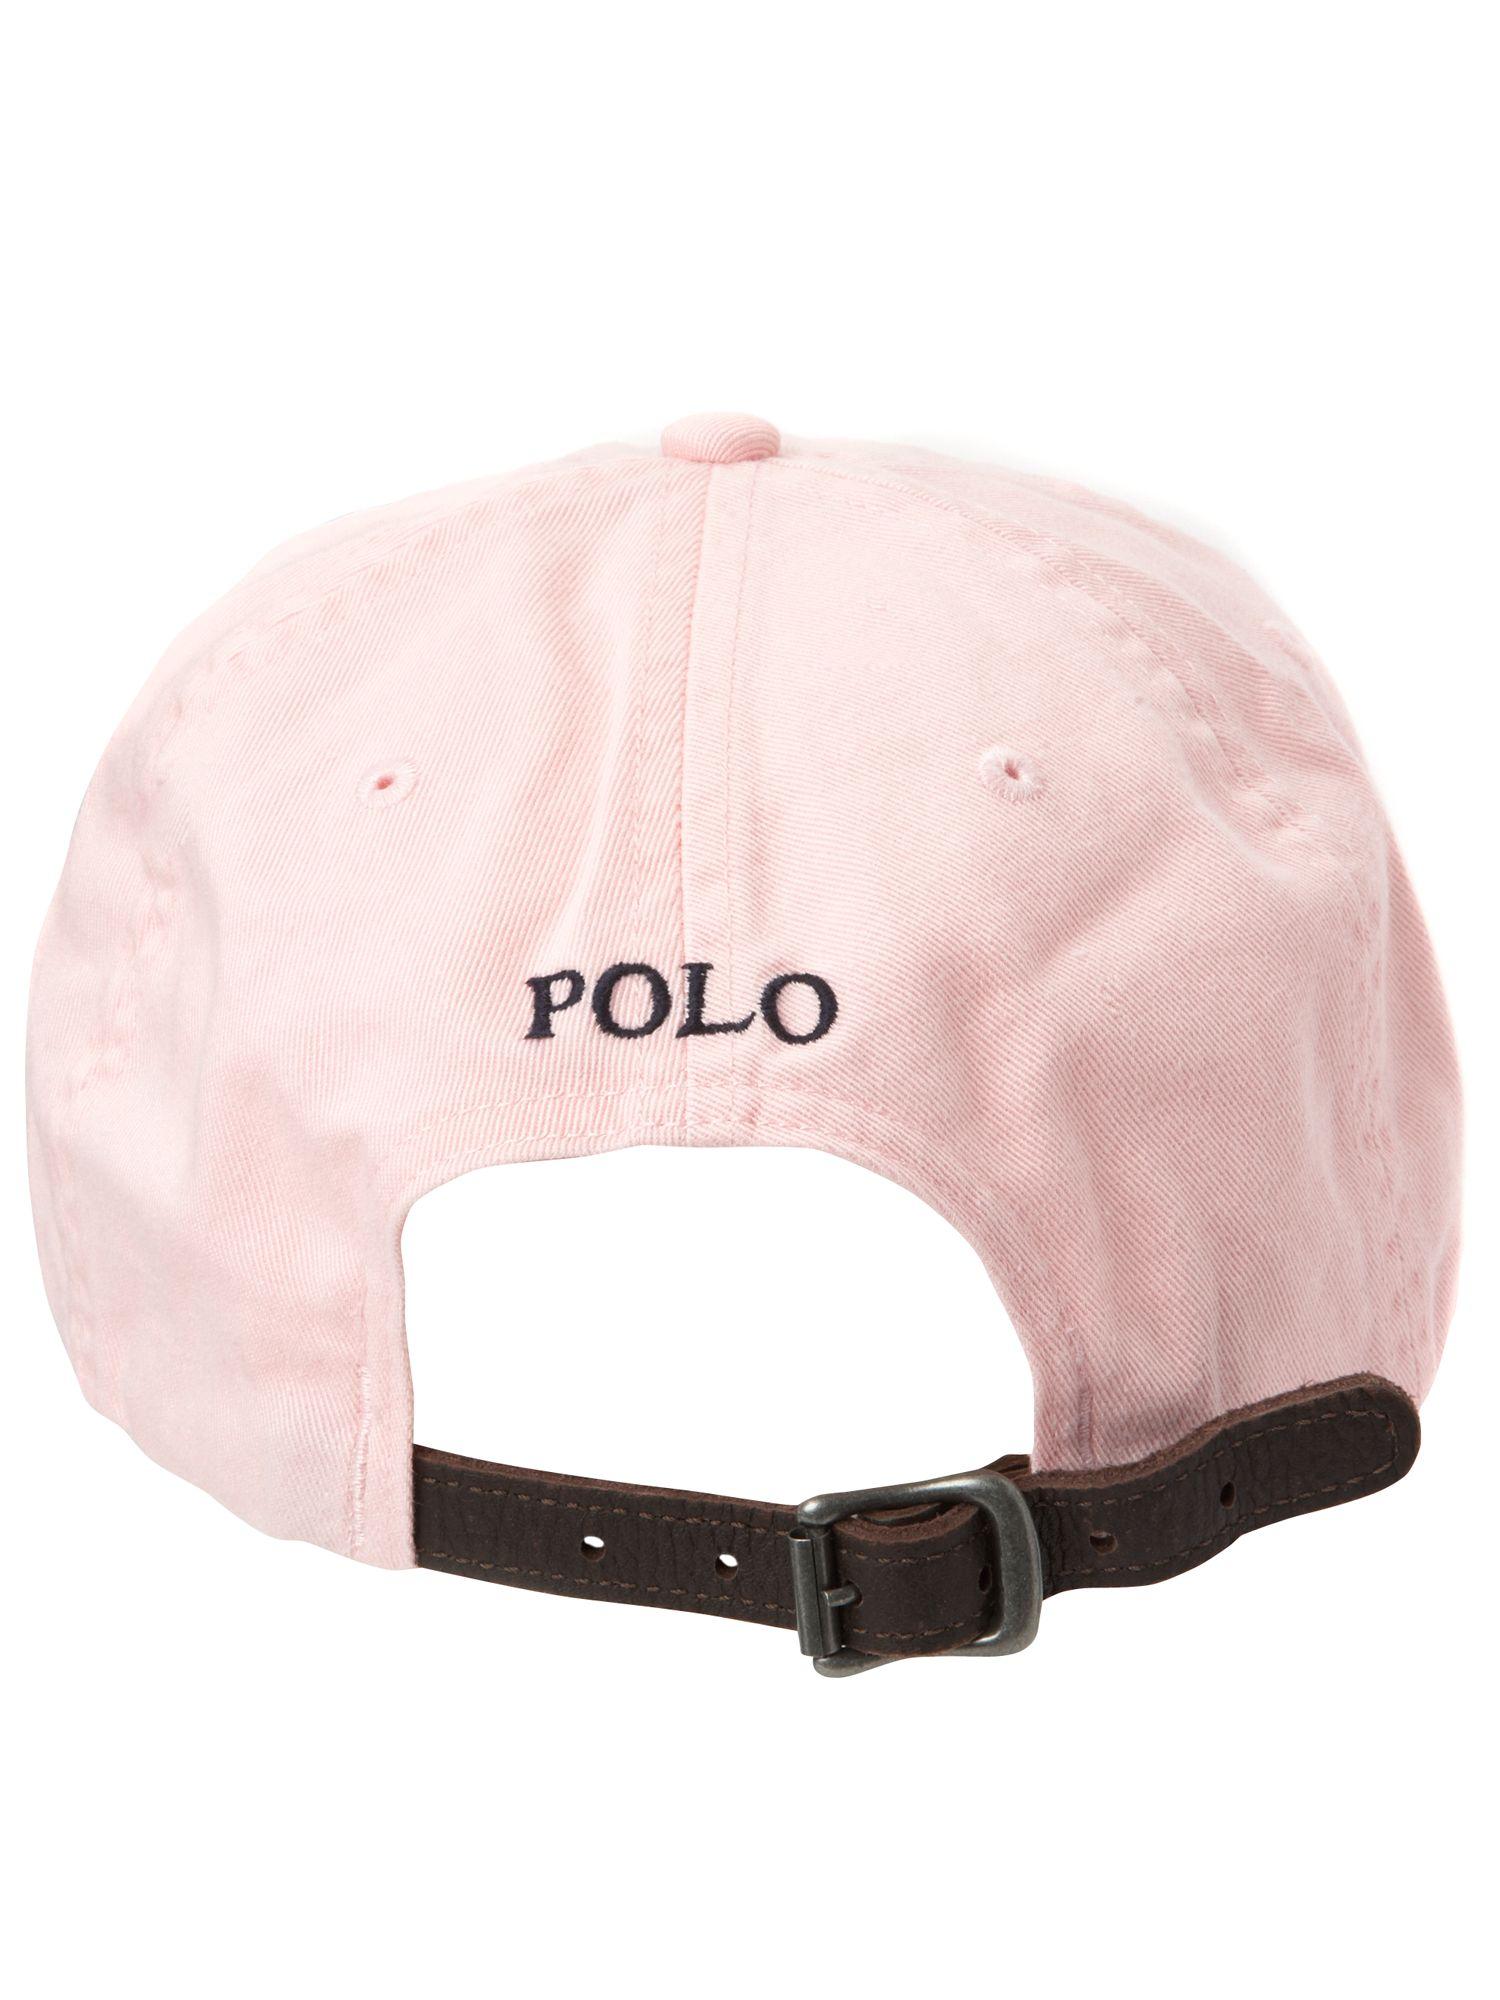 polo ralph lauren logo cap in pink for men lyst. Black Bedroom Furniture Sets. Home Design Ideas